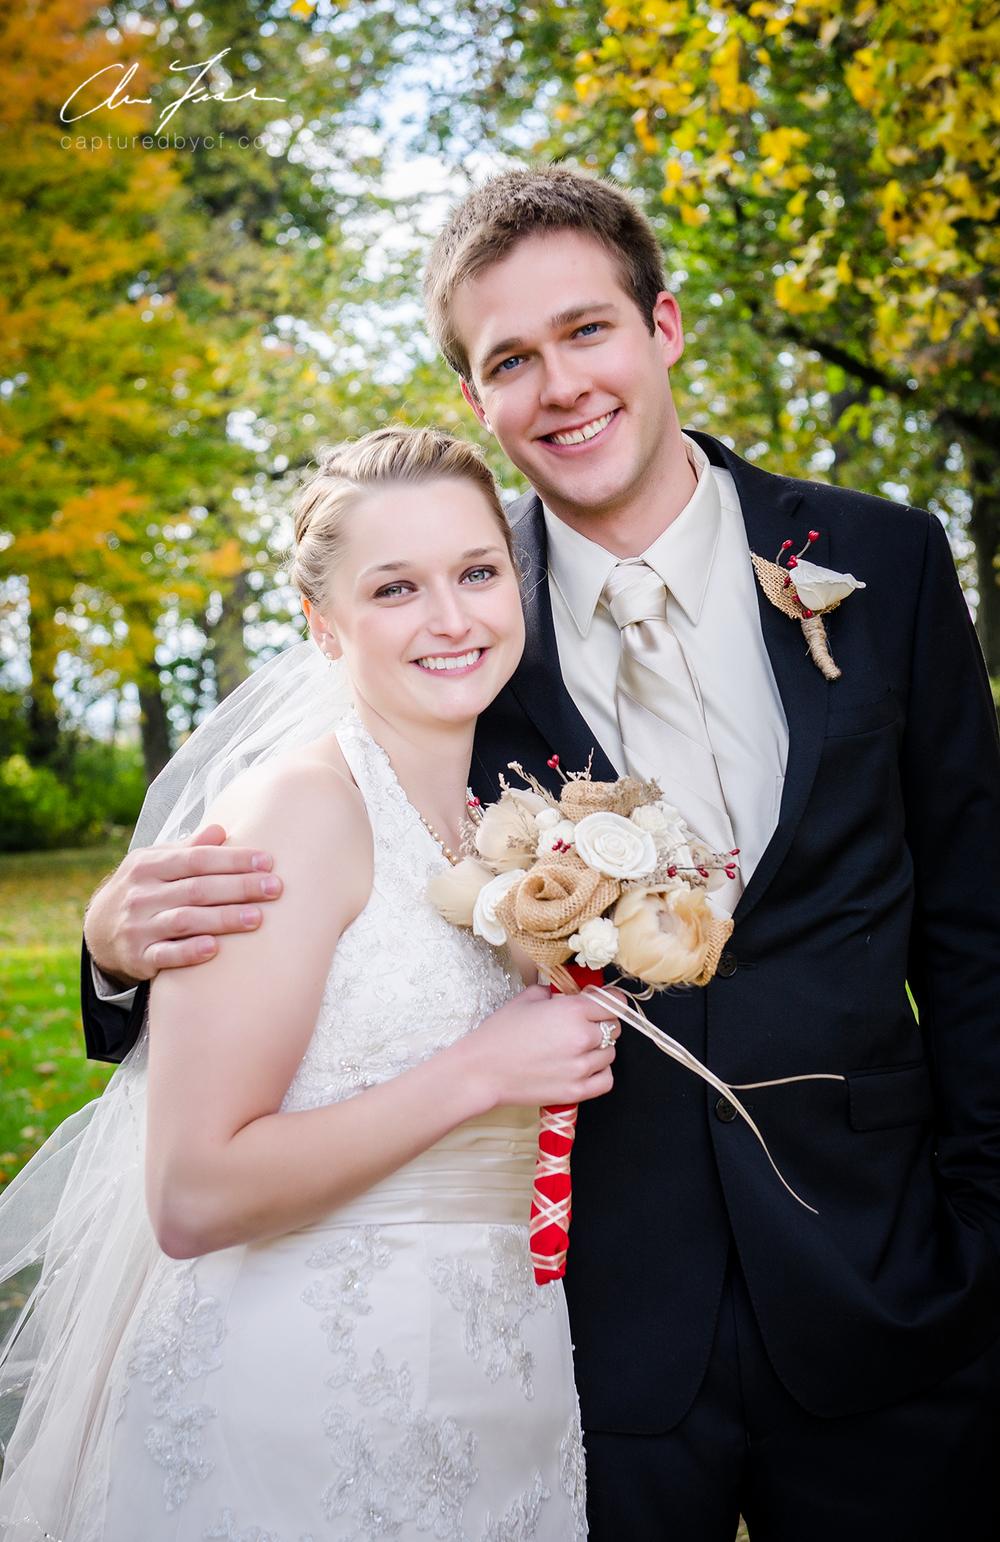 CFPhoto-Wedding-2-21.jpg